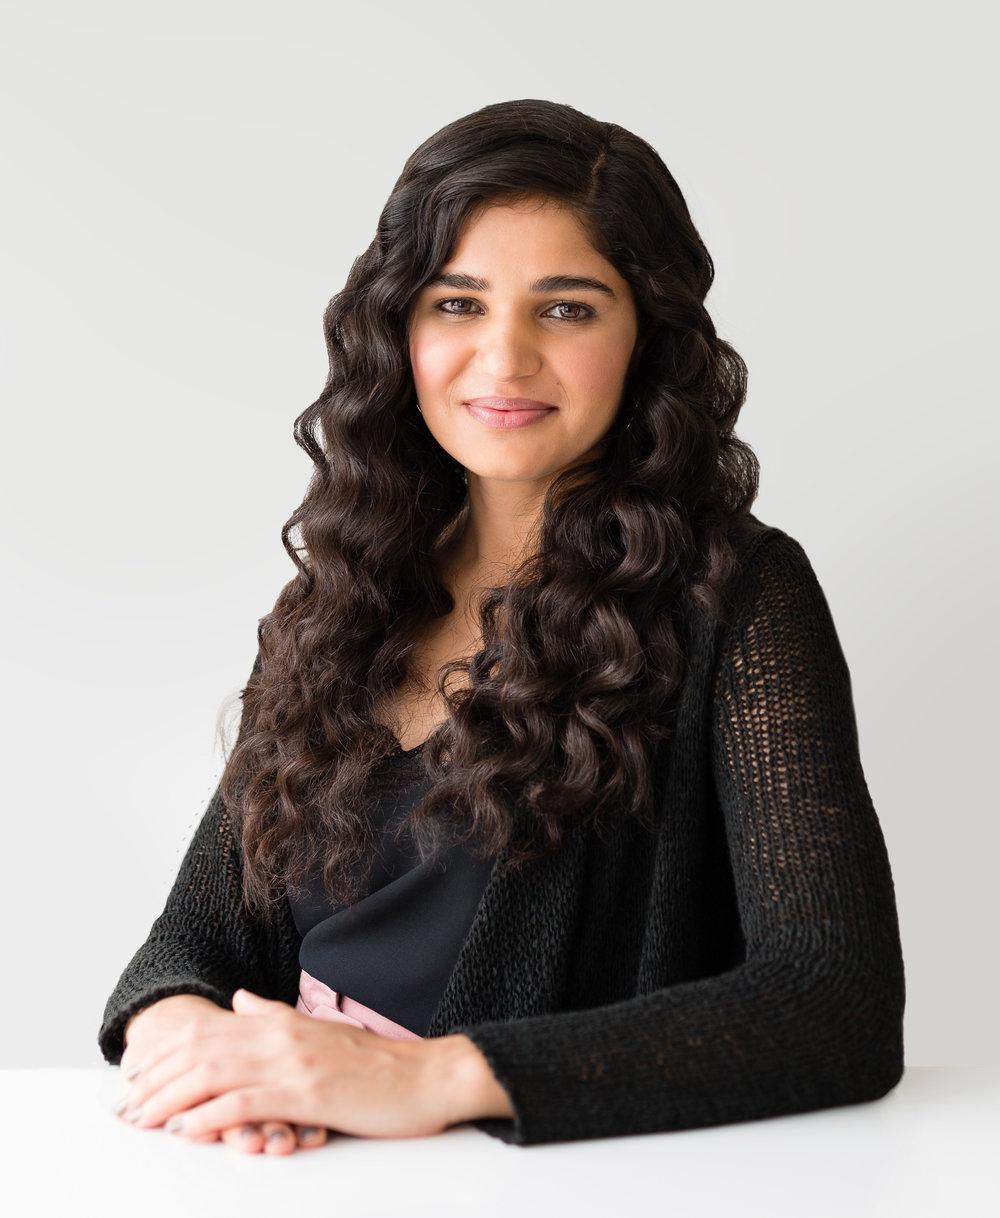 Pooja Choudhary, Associate